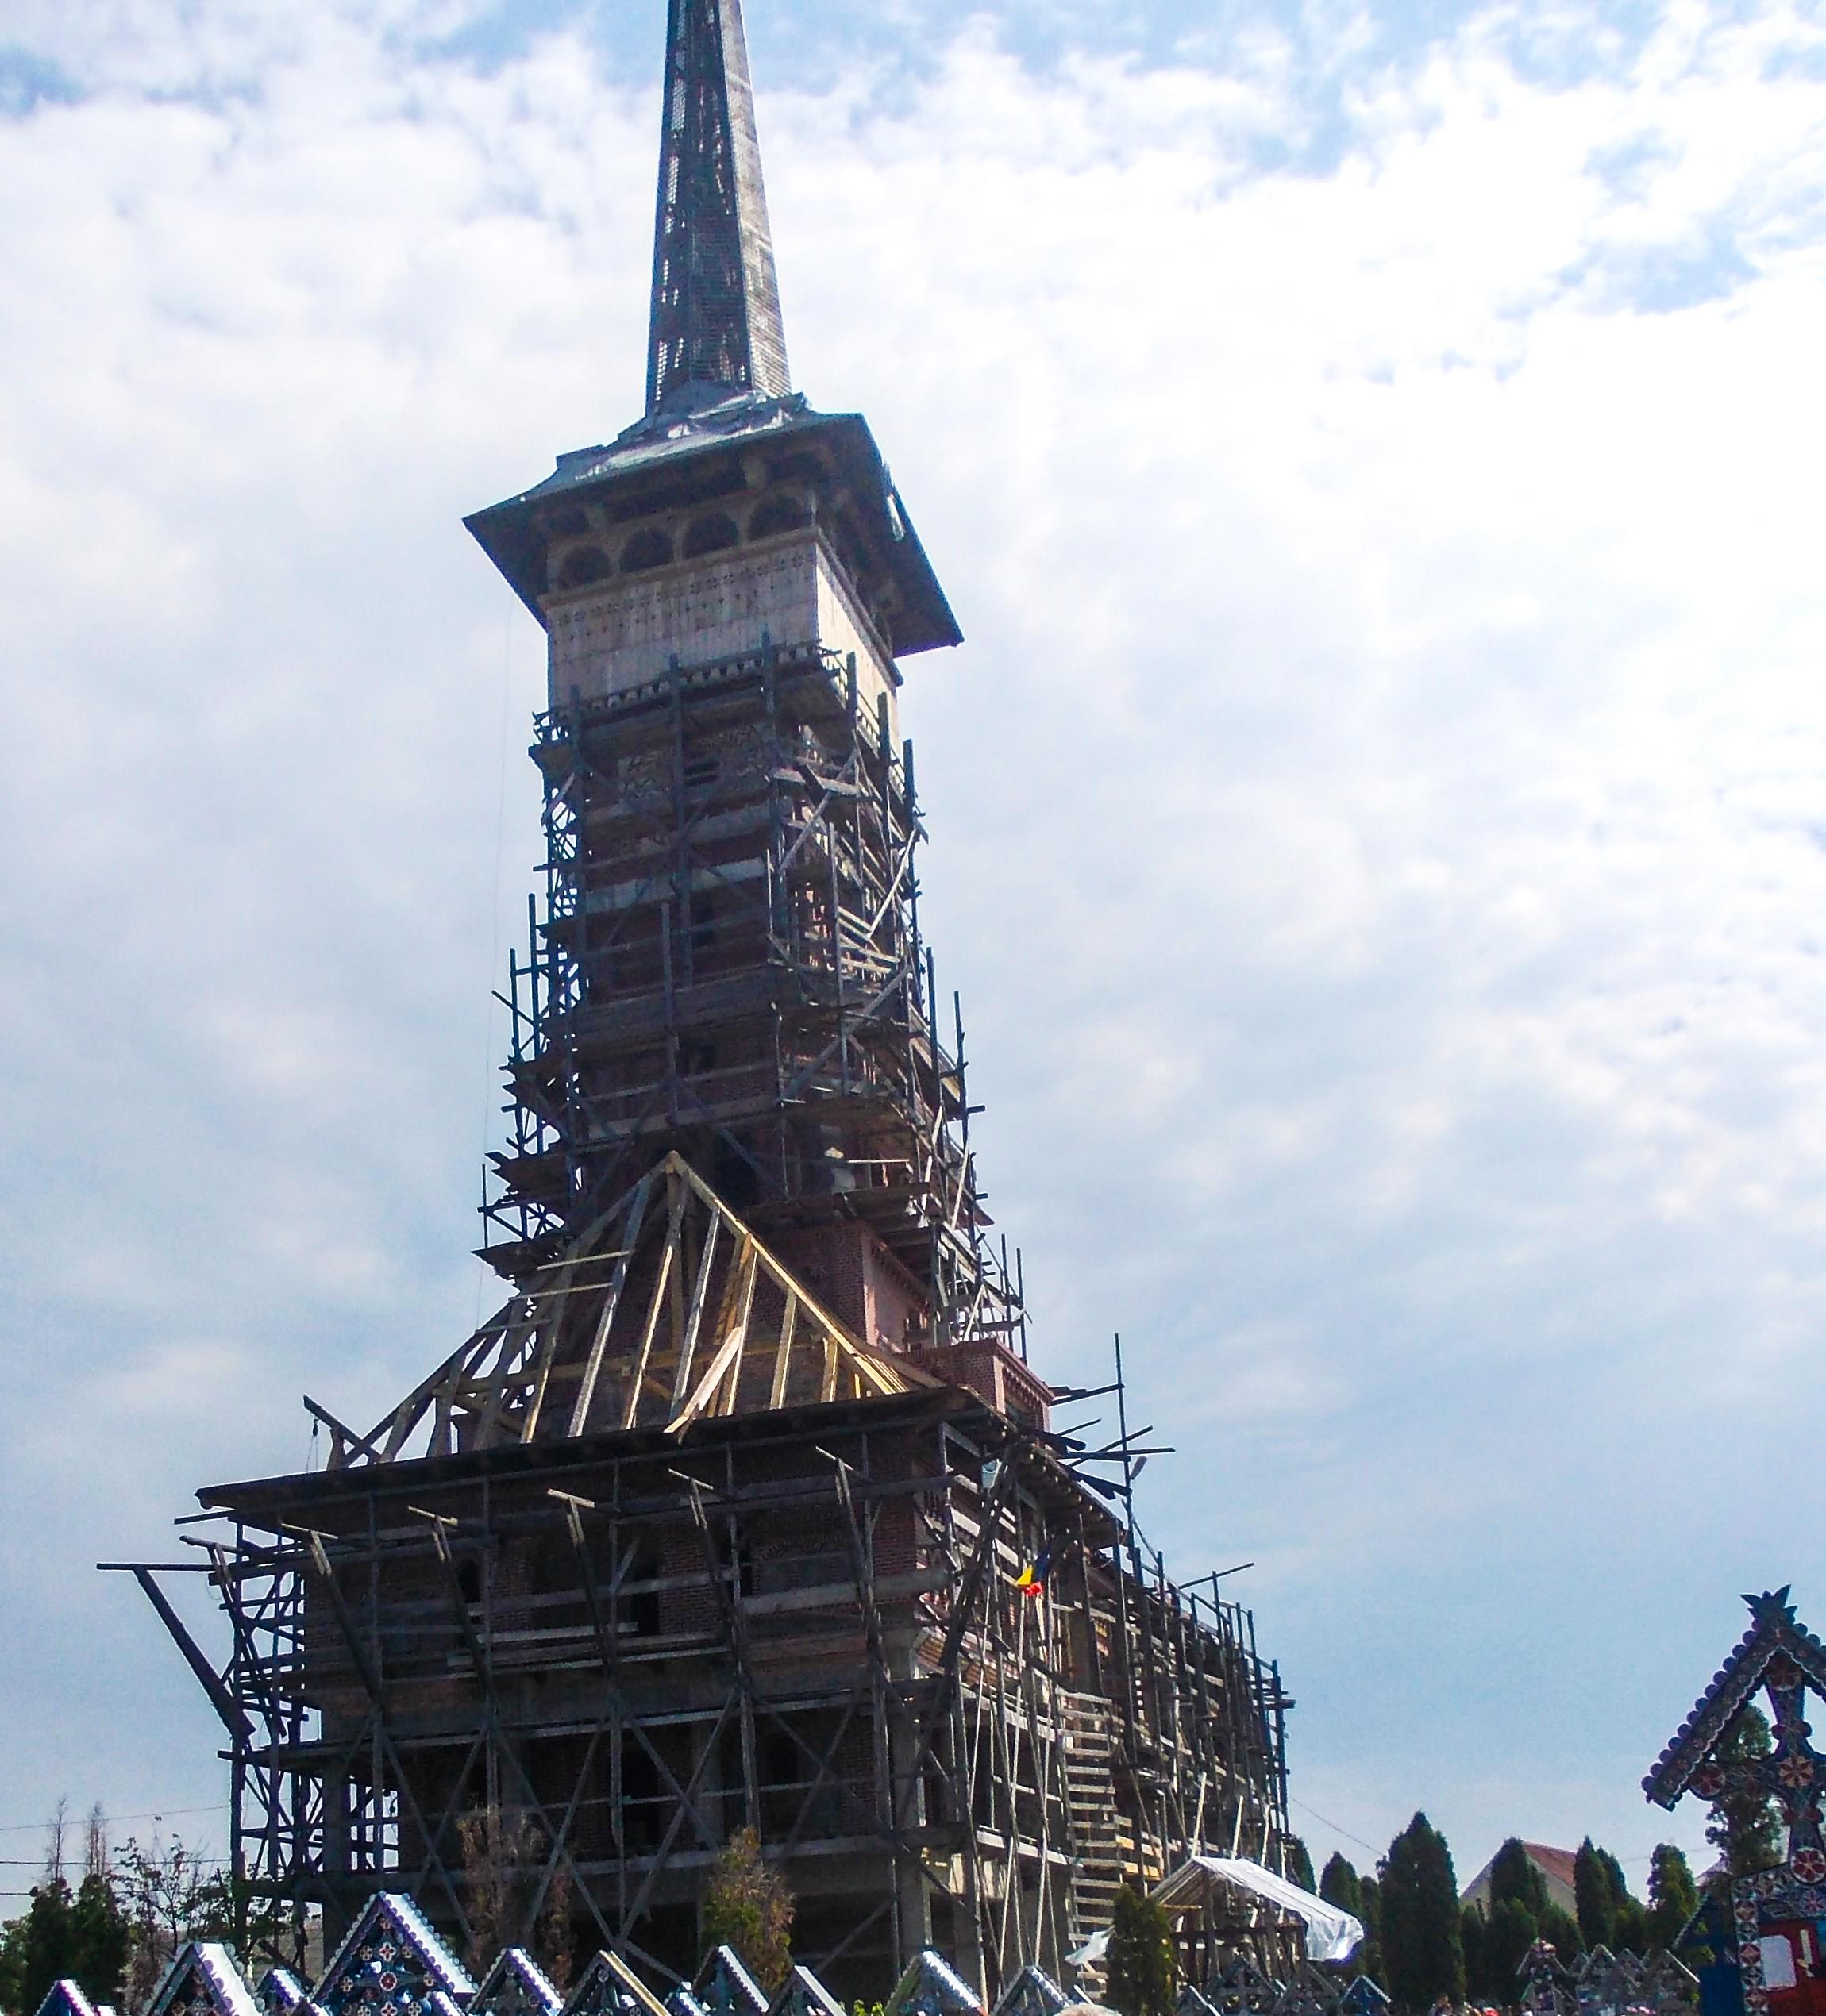 biserica-in-constructie-la-cimitirul-vesel-sapanta_fad00e19c2cde2